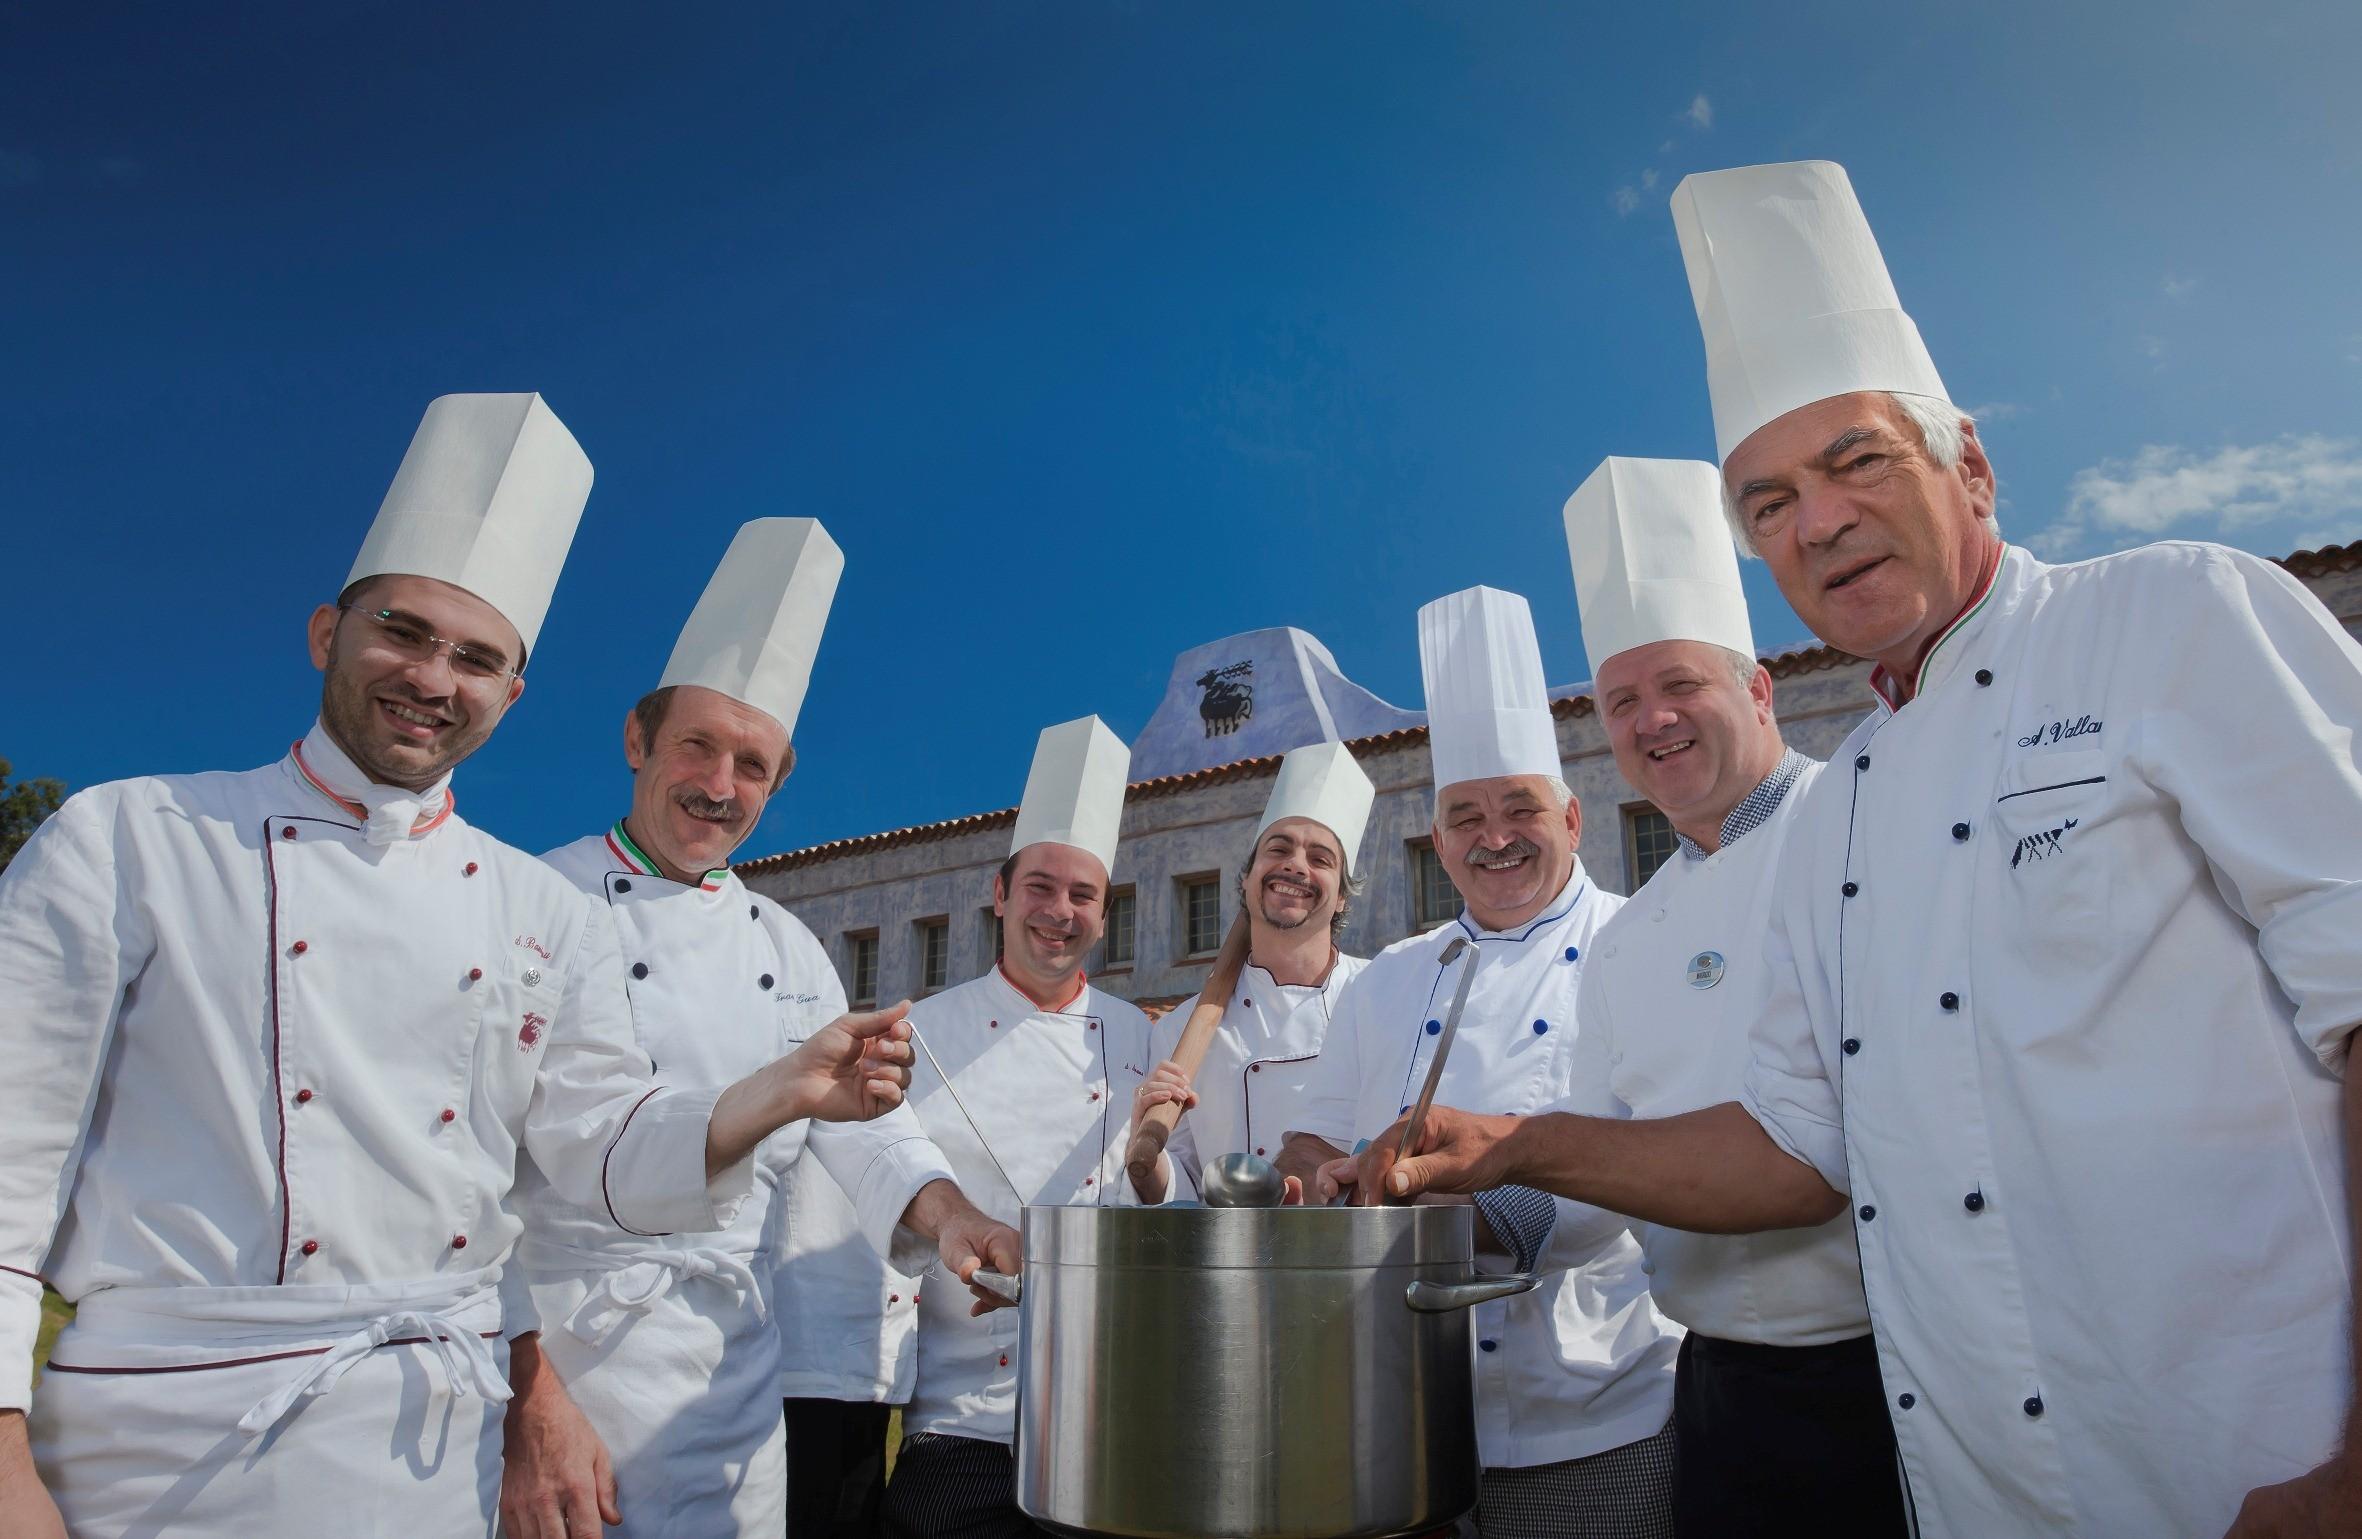 Porto Cervo Food Festival 2015: Die Küchenchefs